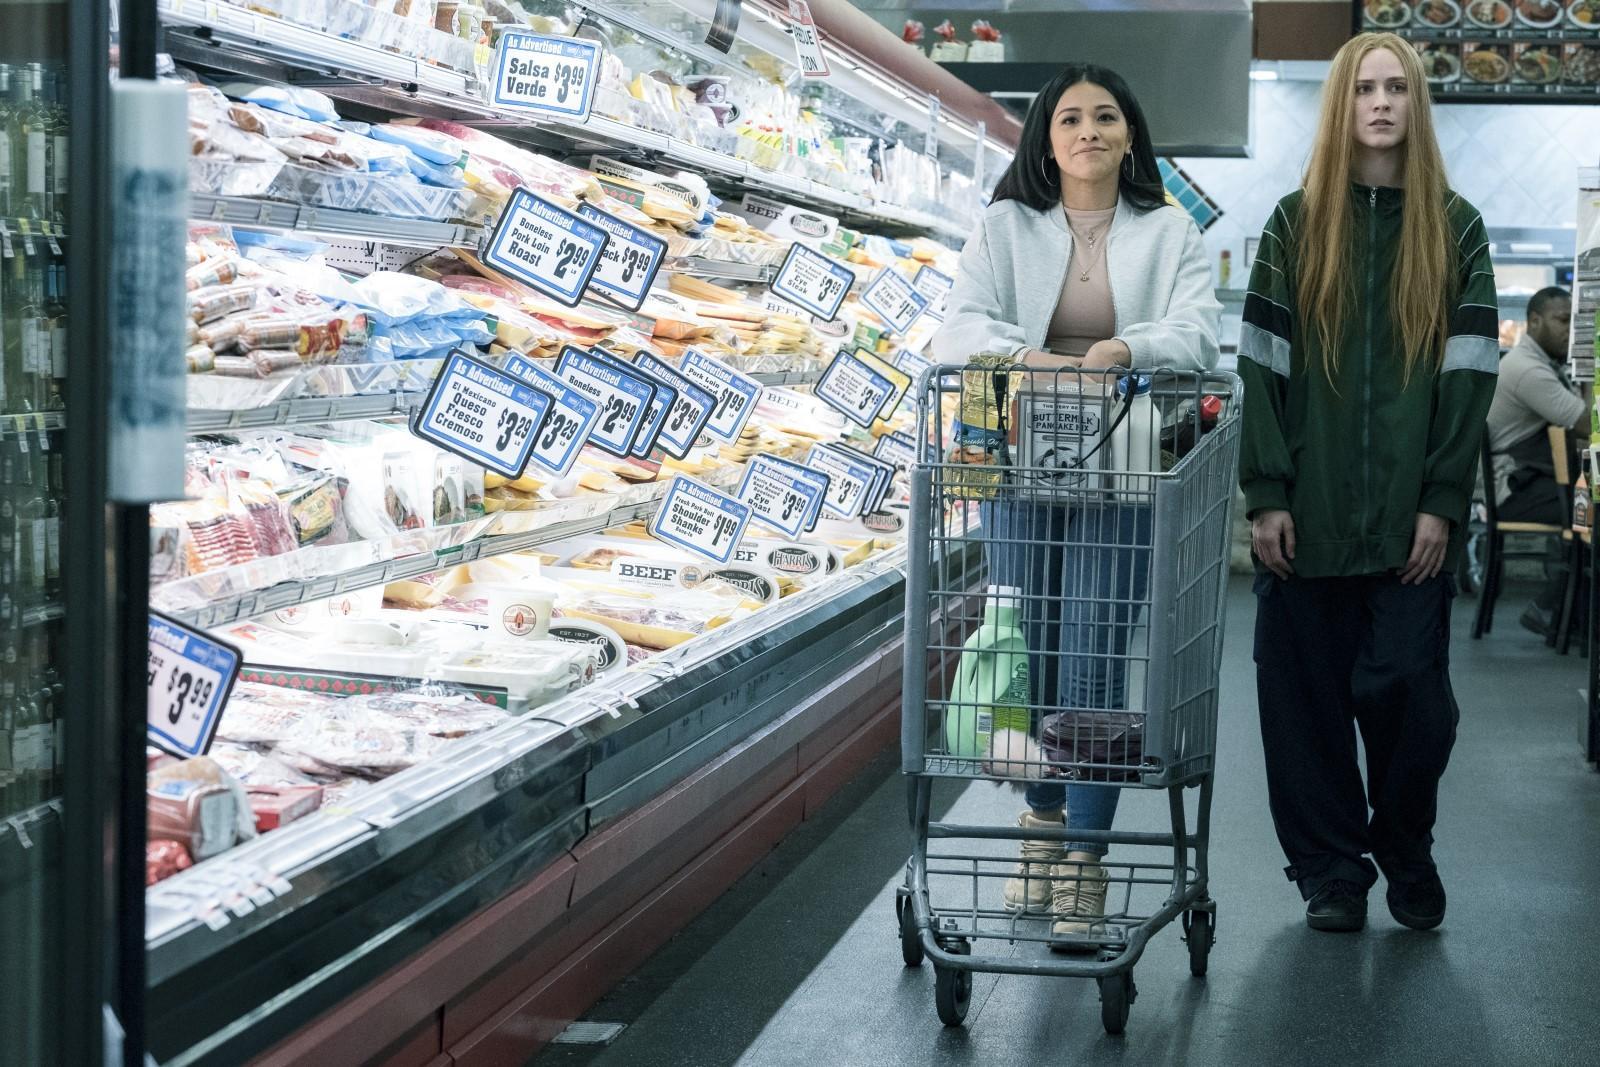 Ewan Rachel Wood et Gina Rodriguez dans kajilionnaire